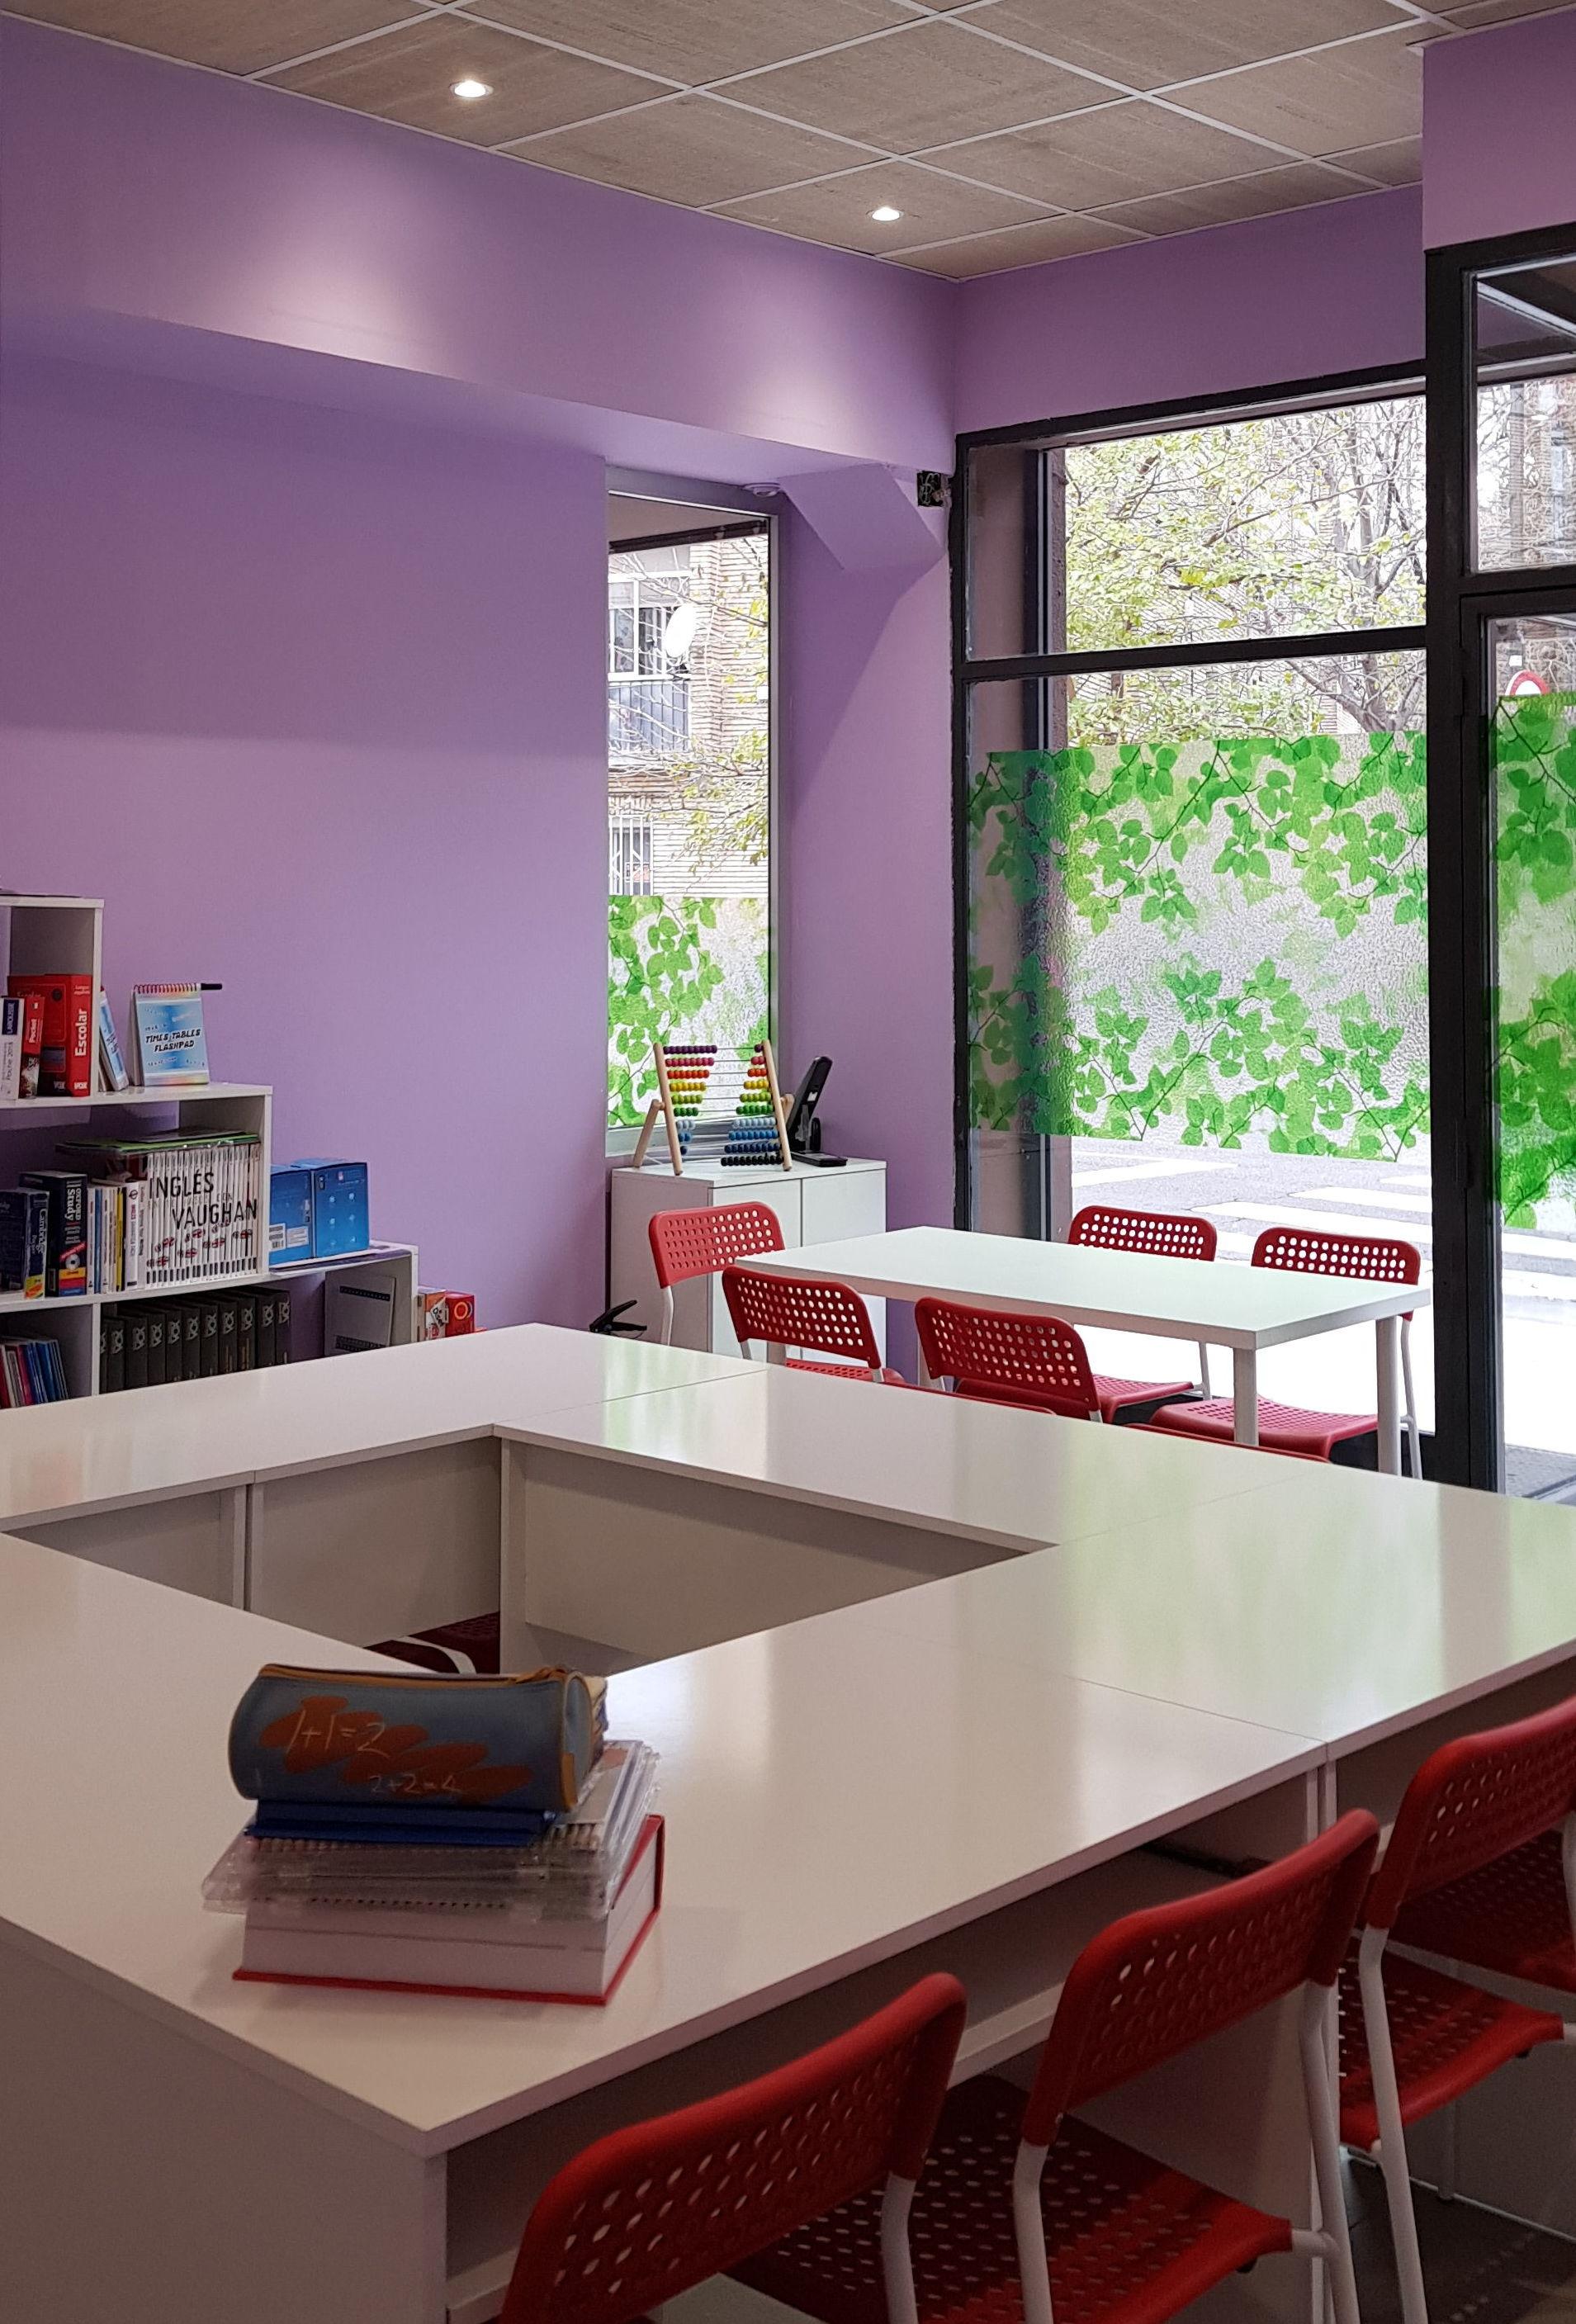 Centro de estudios en Zaragoza